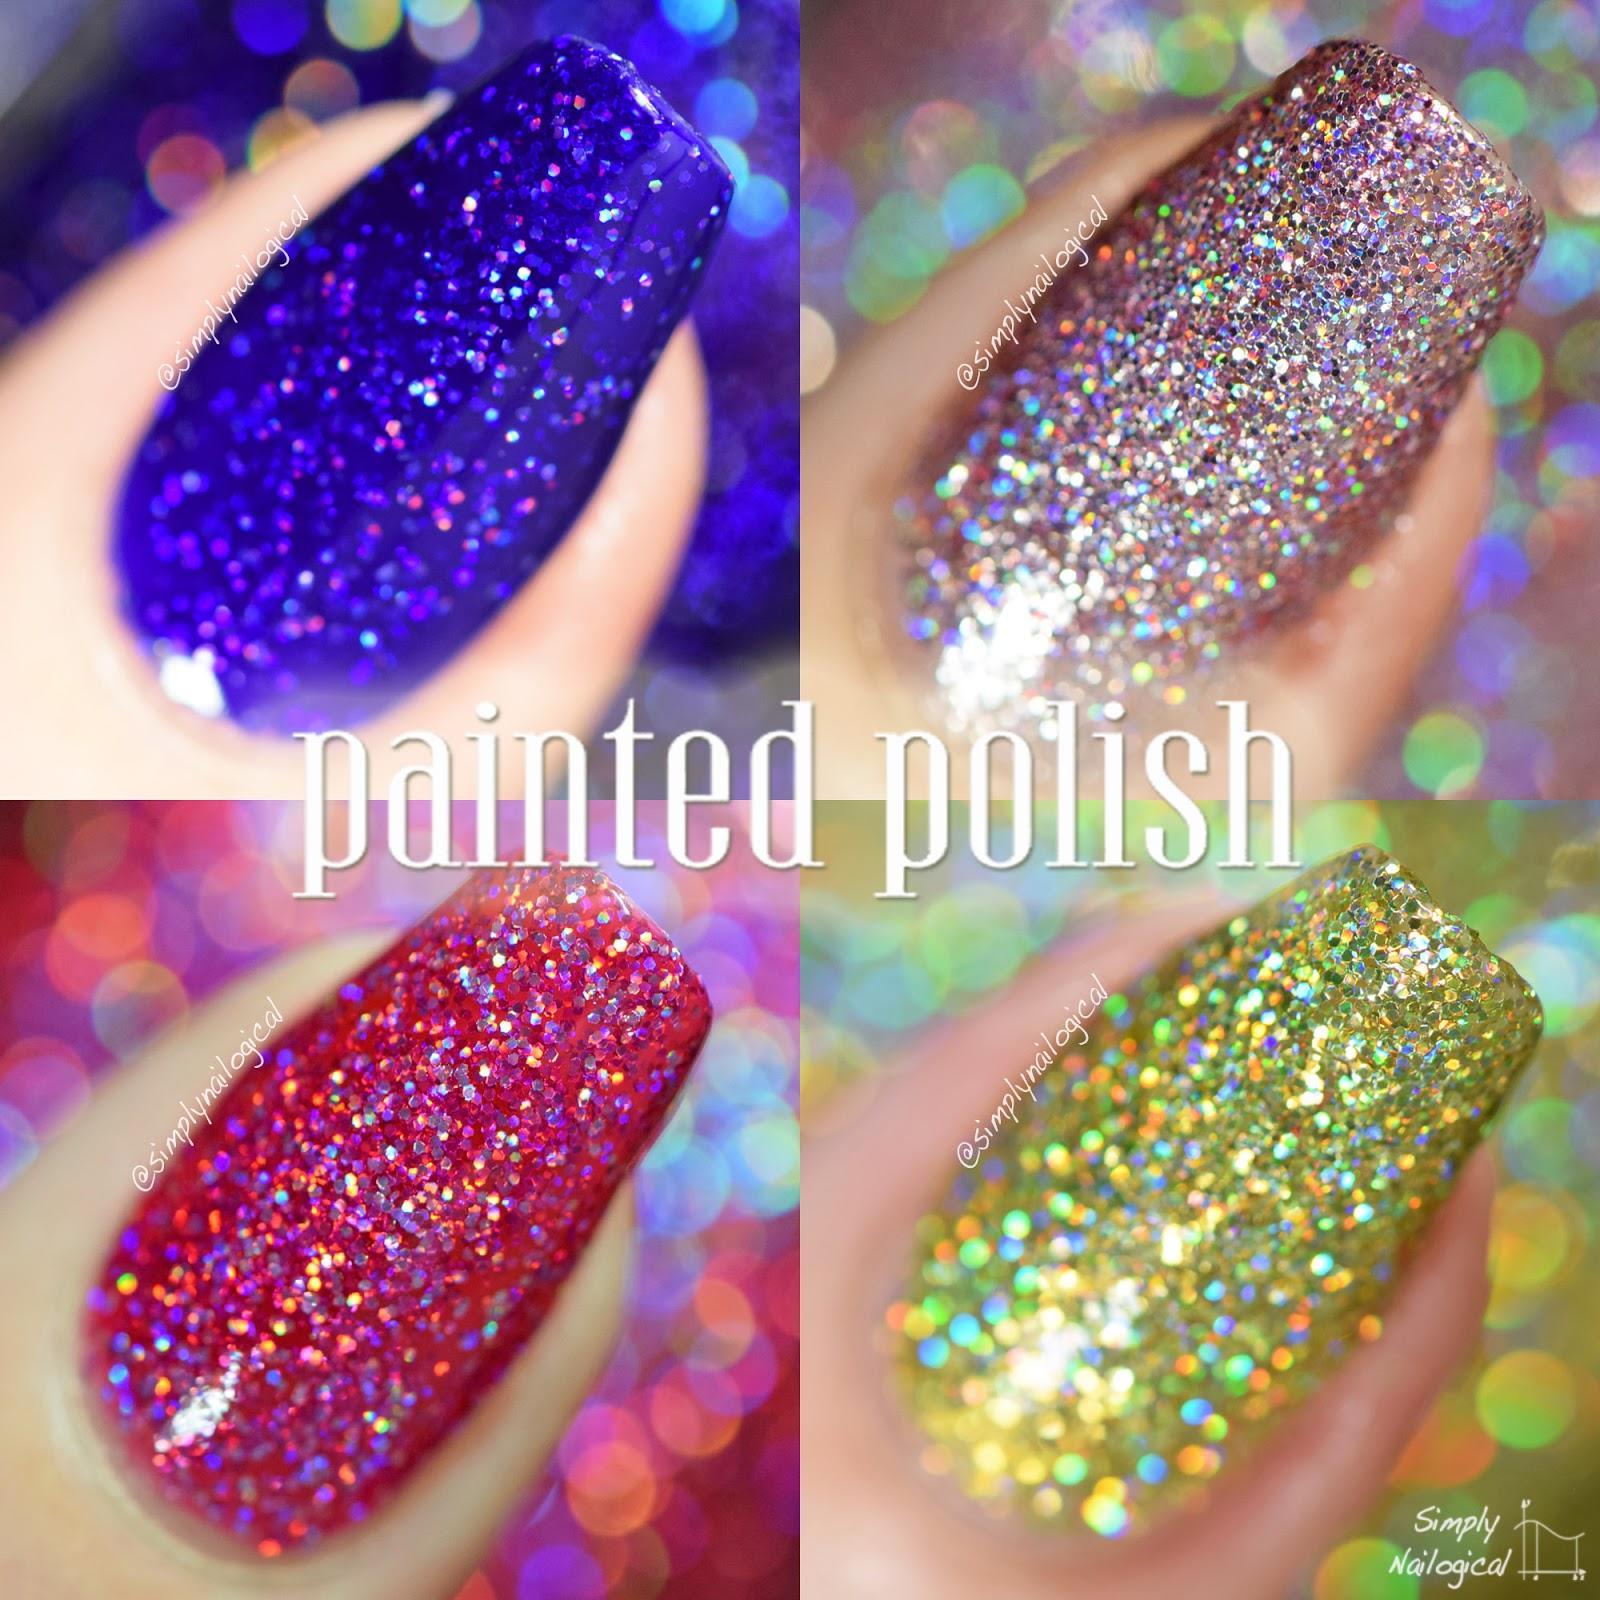 Painted Polish holo glitters macro